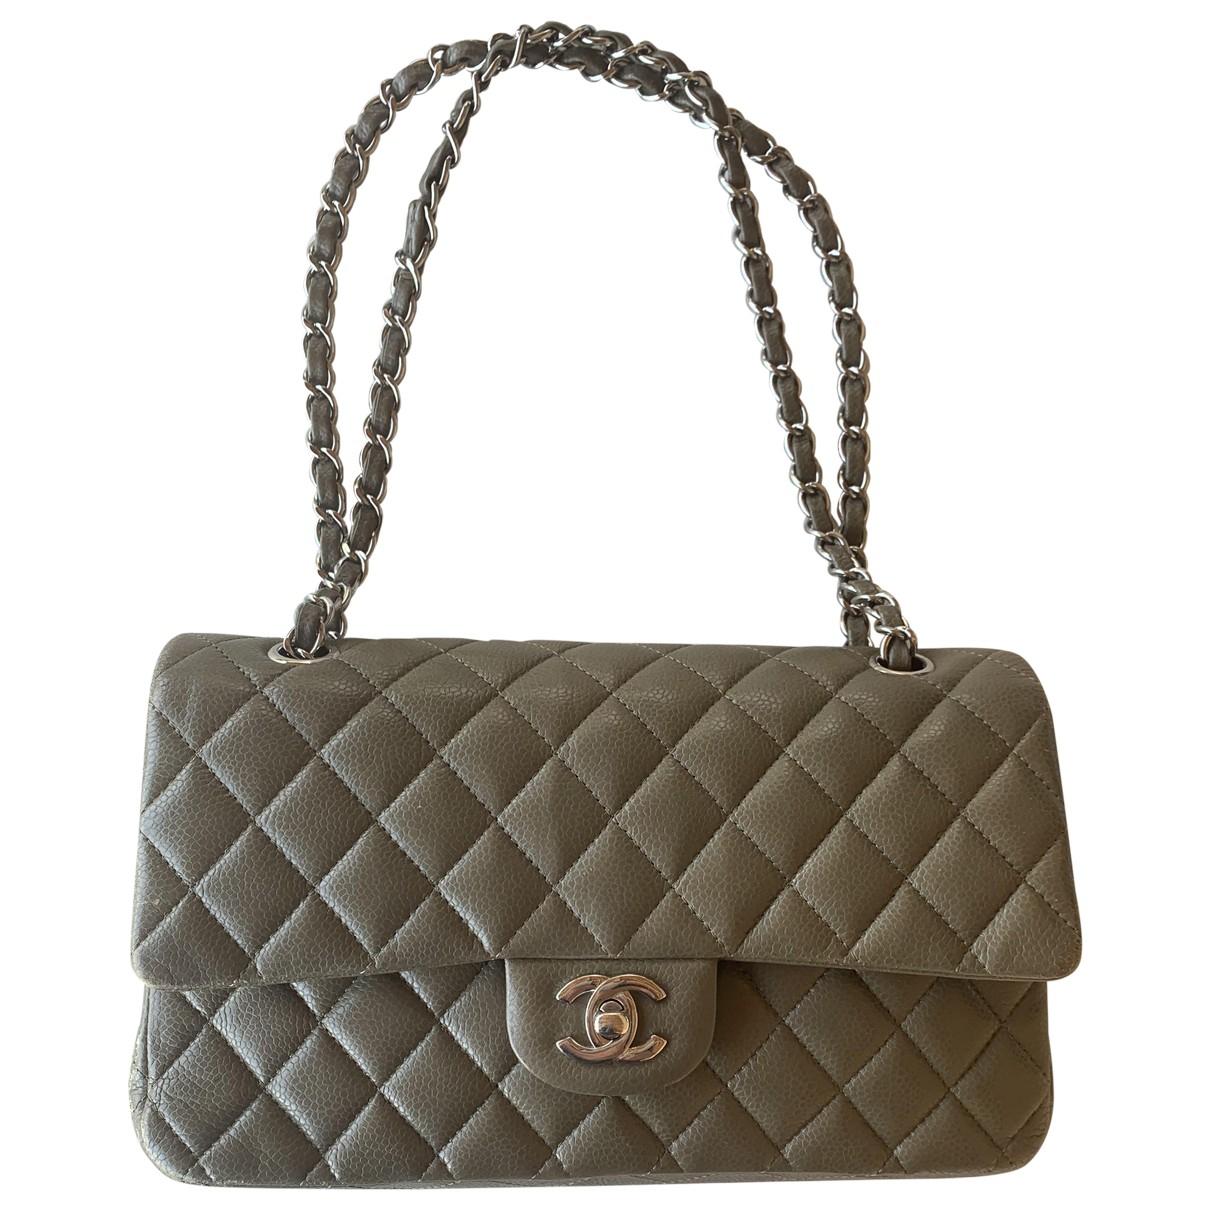 Chanel Timeless/Classique Khaki Leather handbag for Women \N